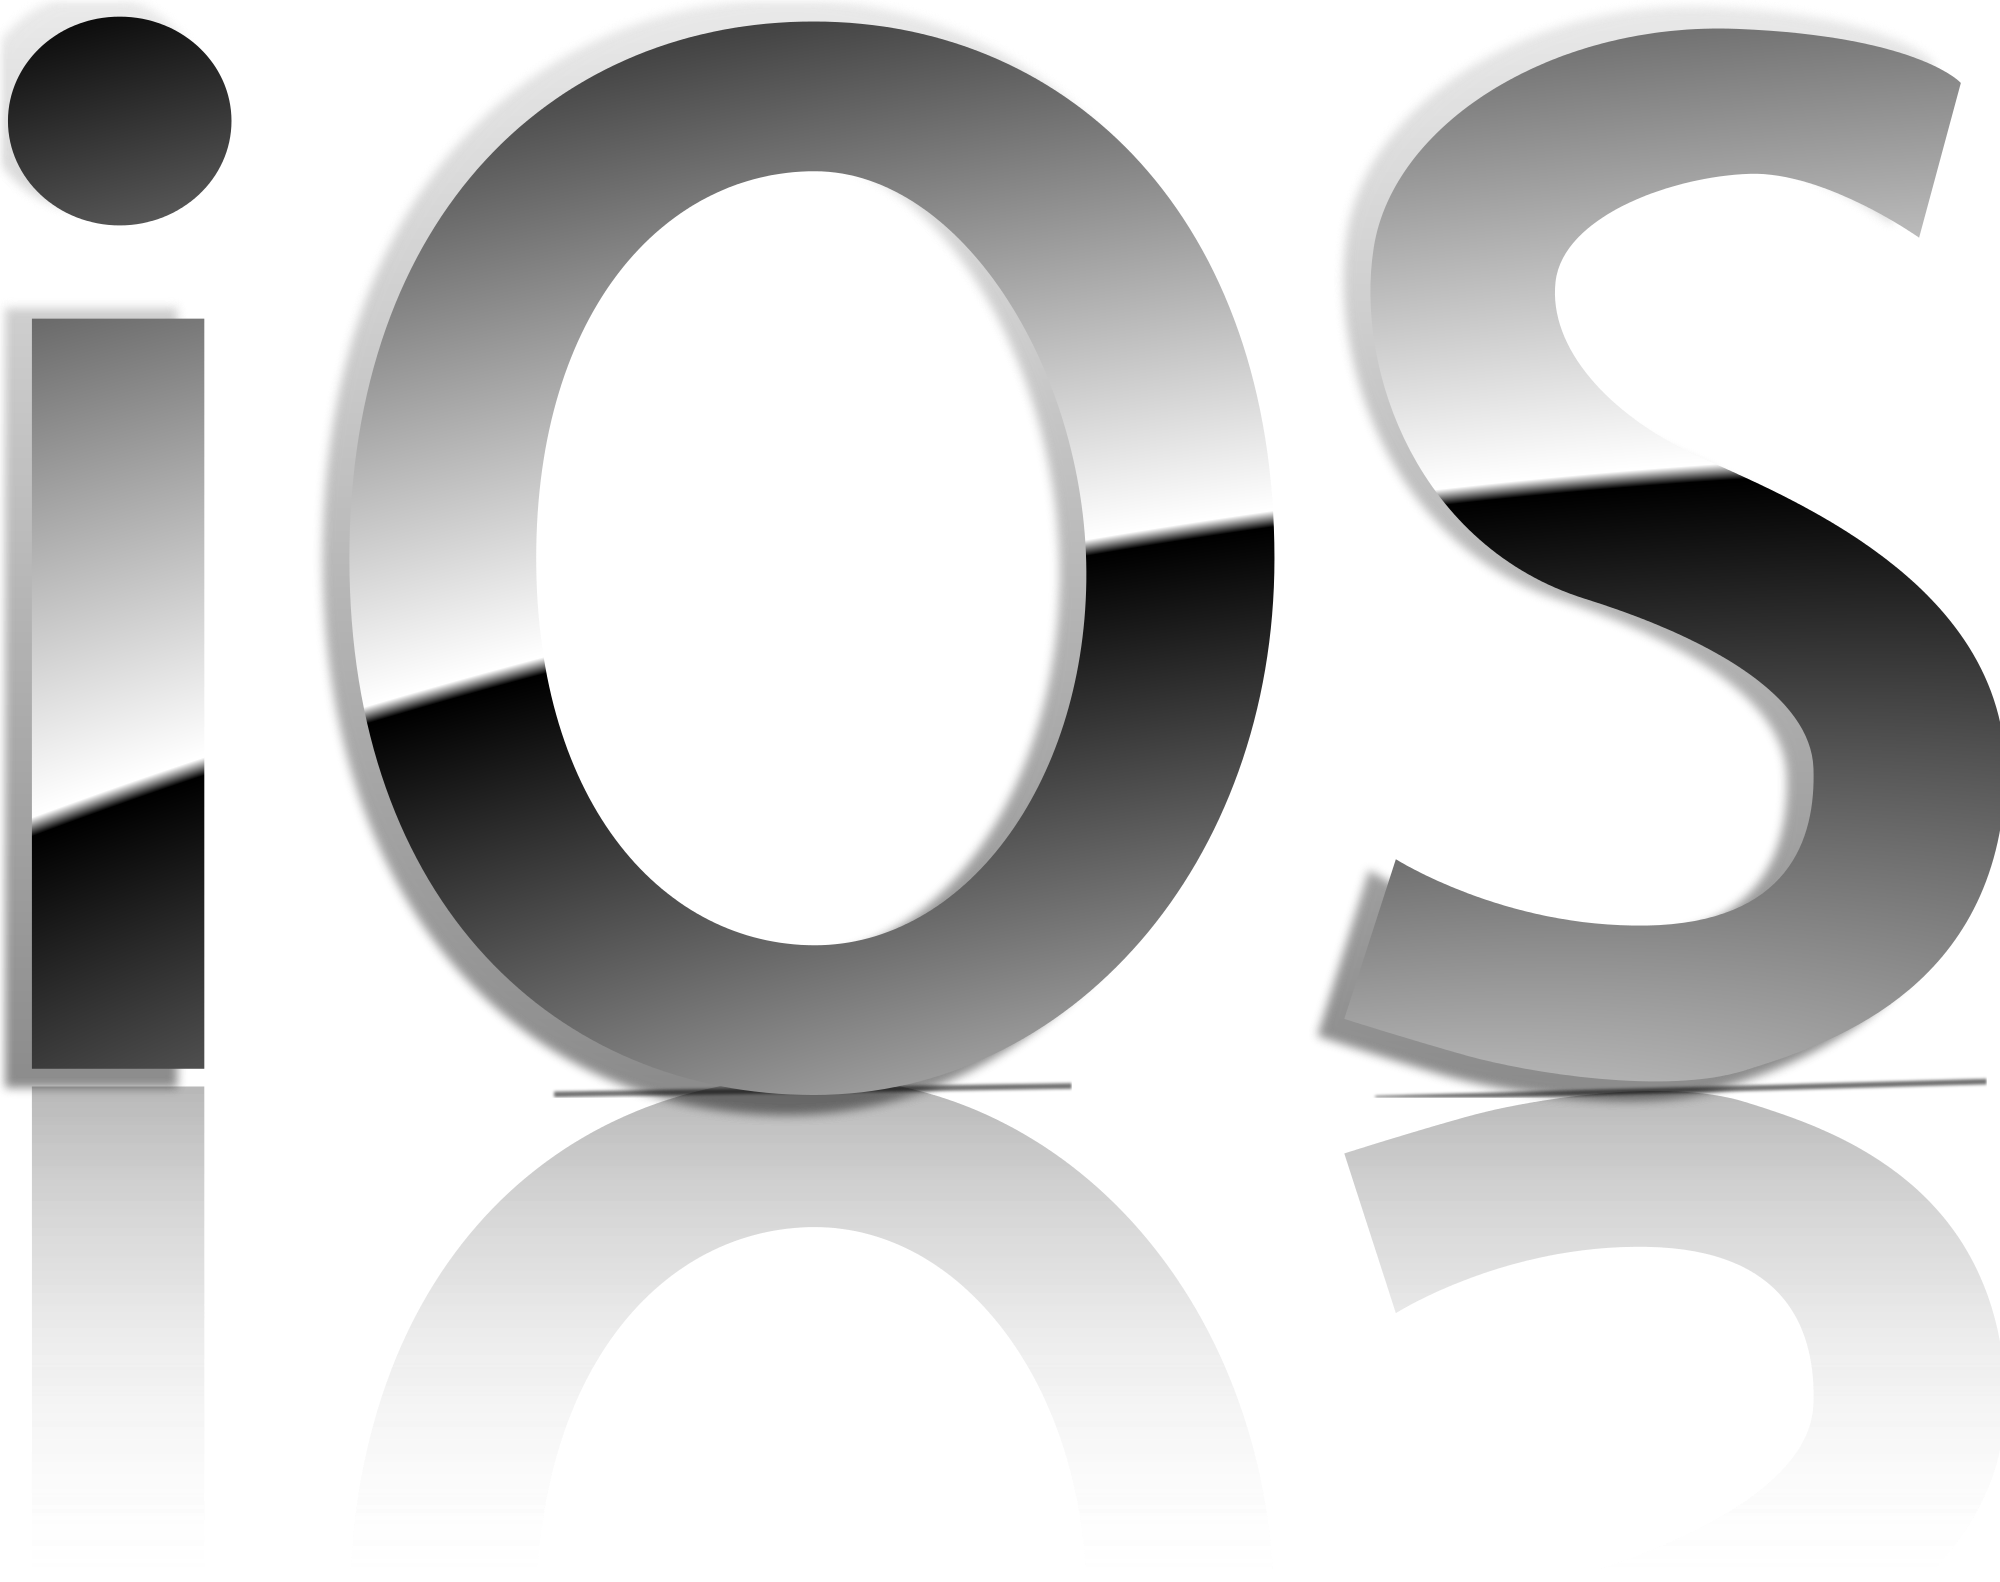 Open Hdpng.com  - Apple Ios, Transparent background PNG HD thumbnail